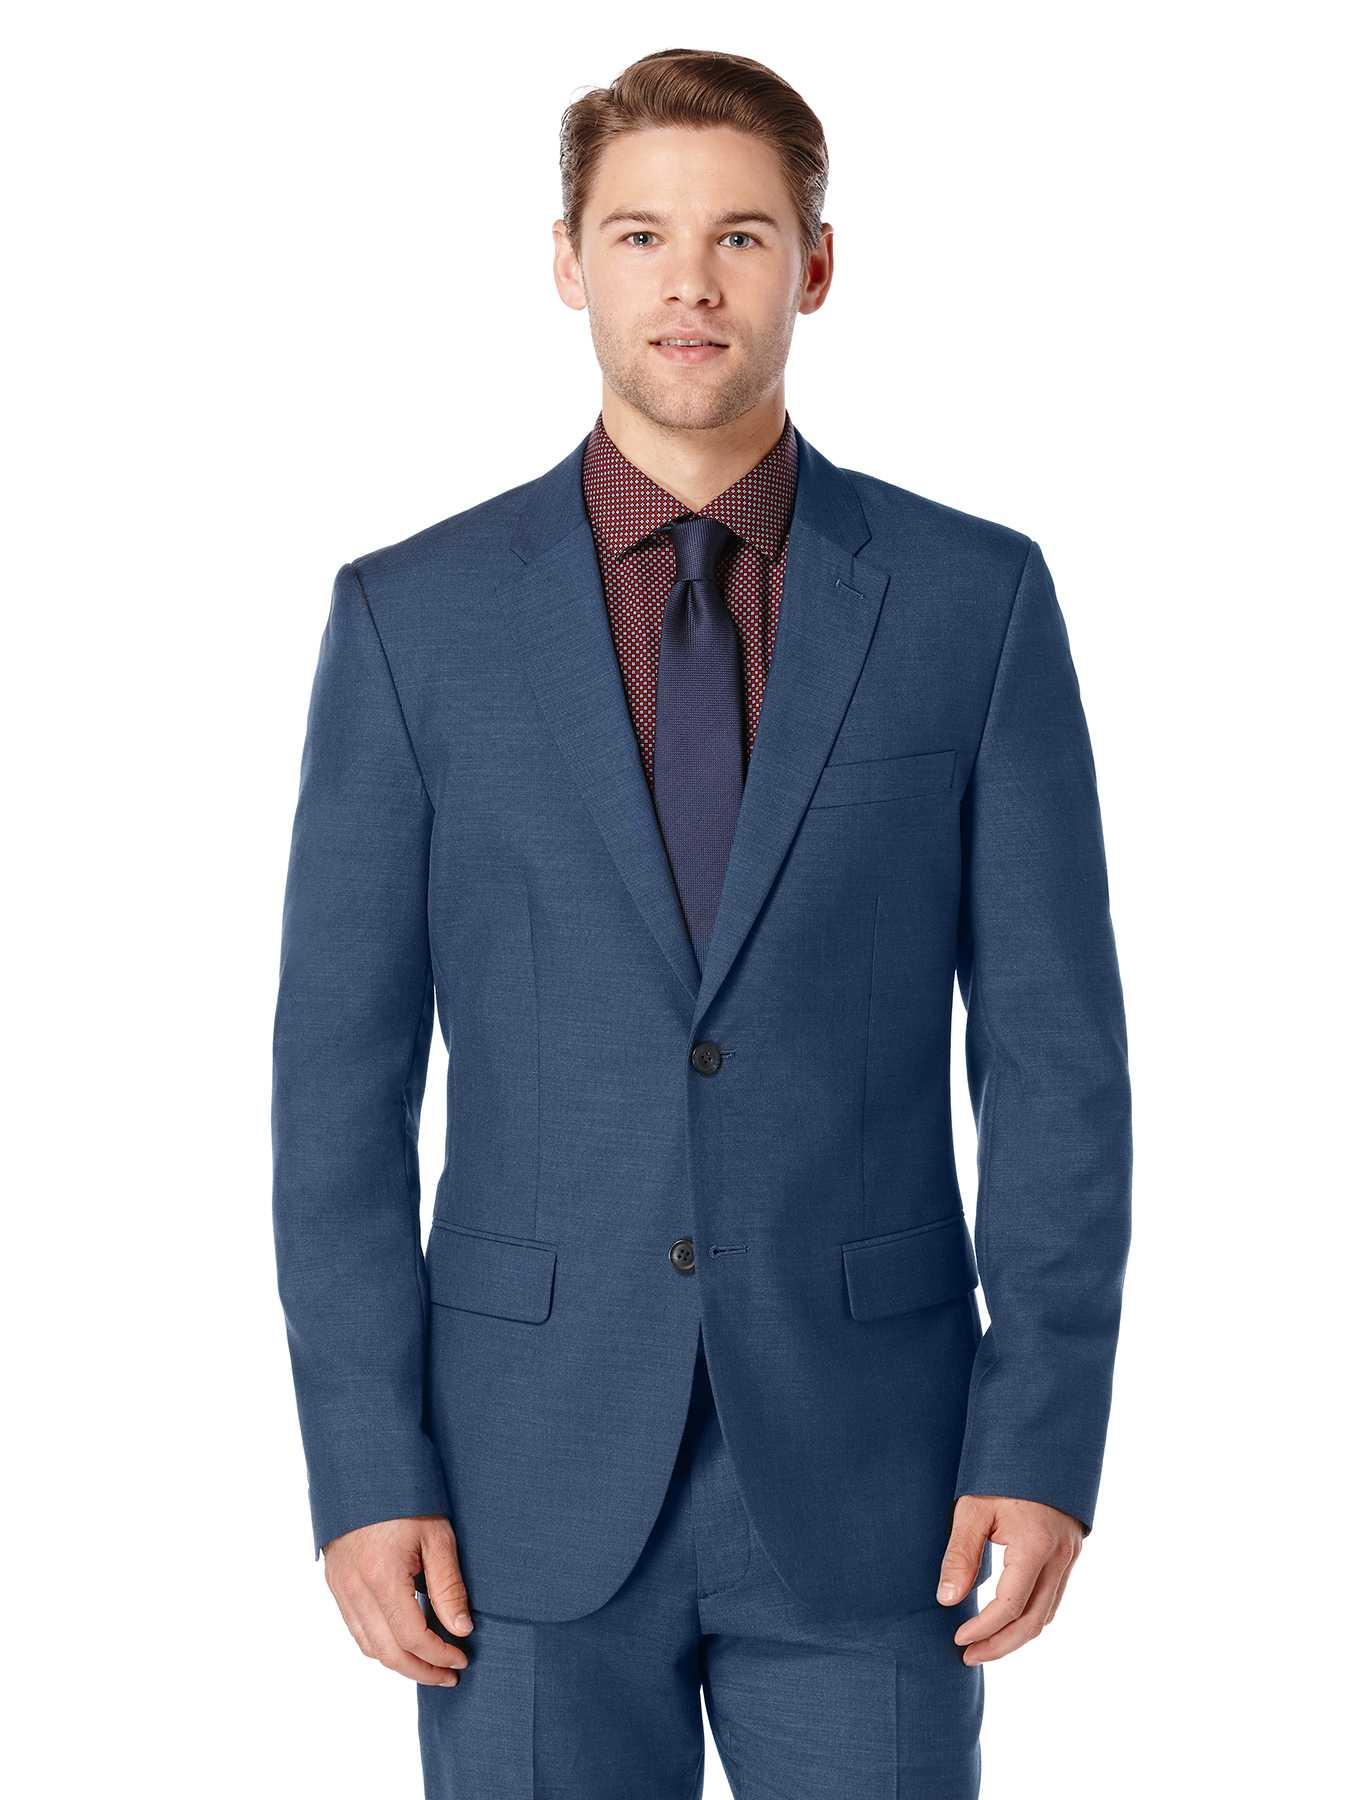 Perry Ellis Slim Fit Two Toned Suit Jacket